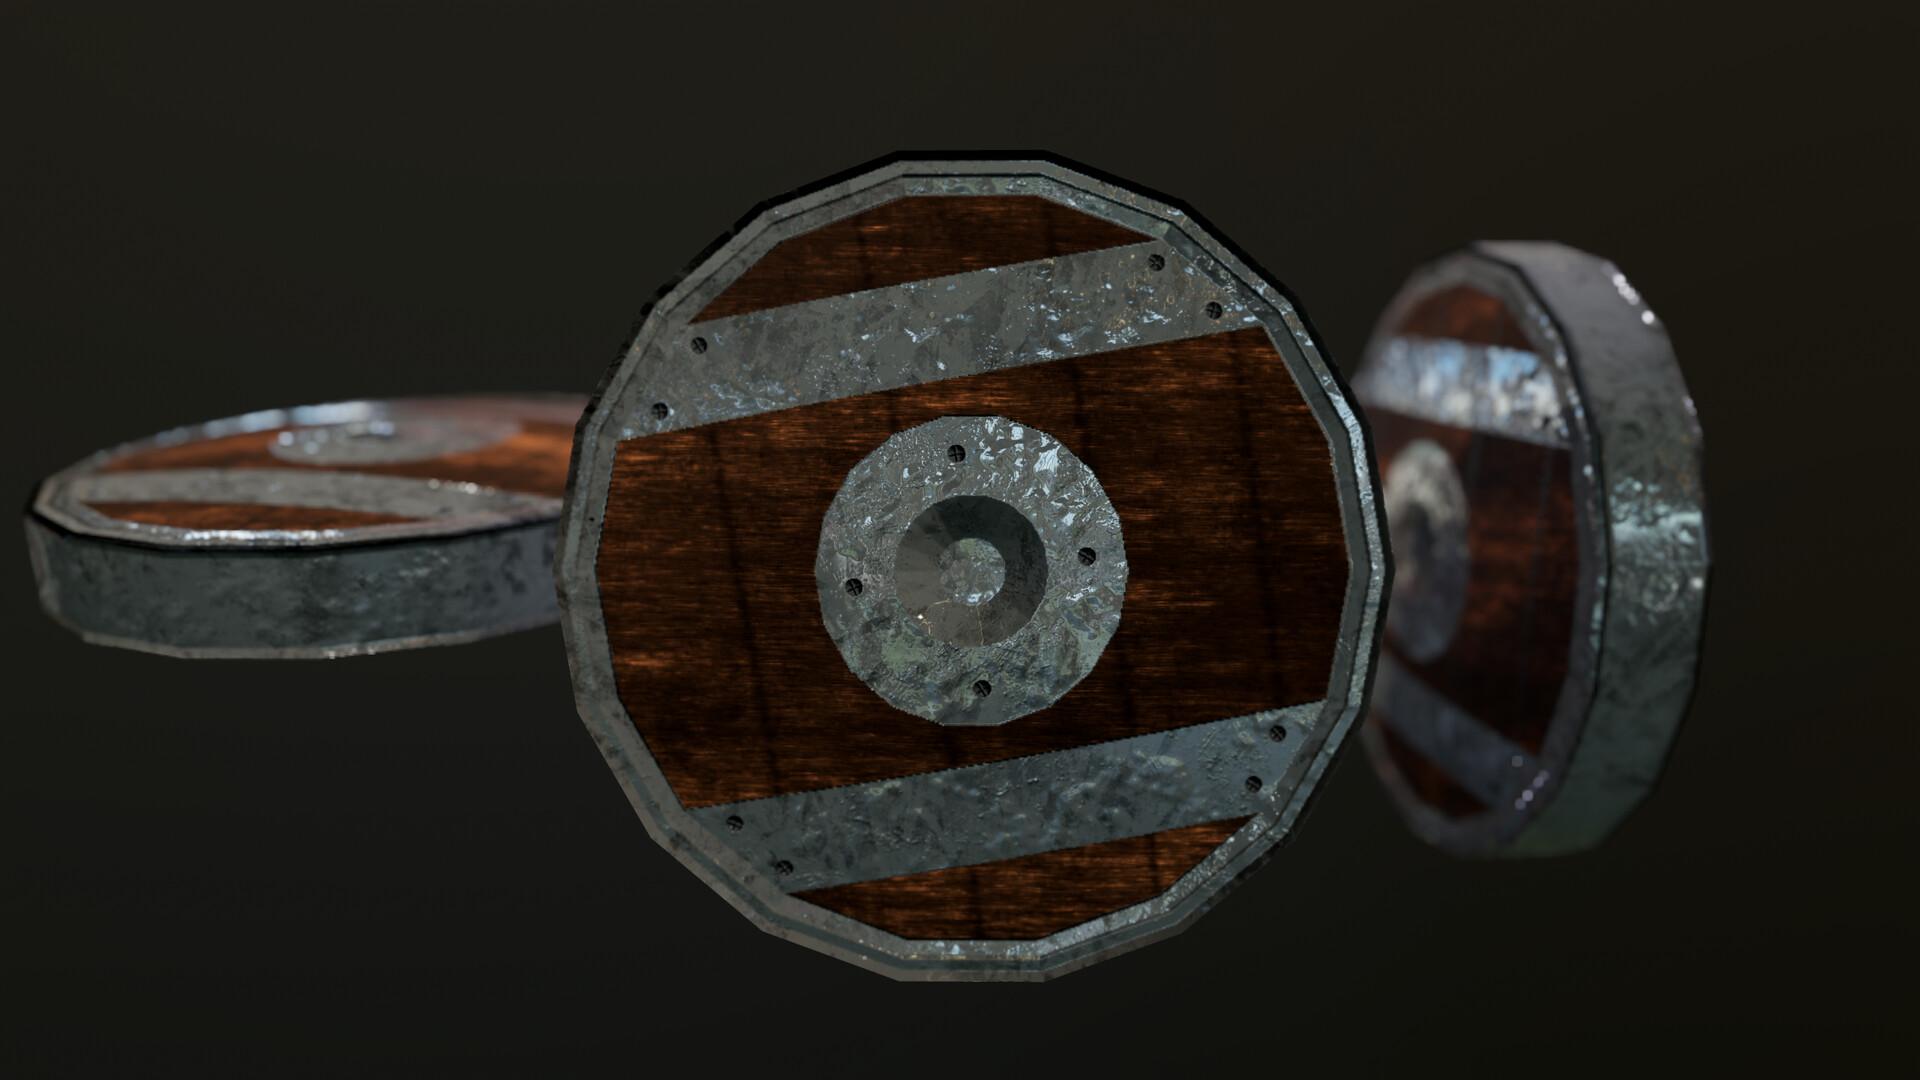 ArtStation - Medieval wheel for war engine, Ioan Parfenie